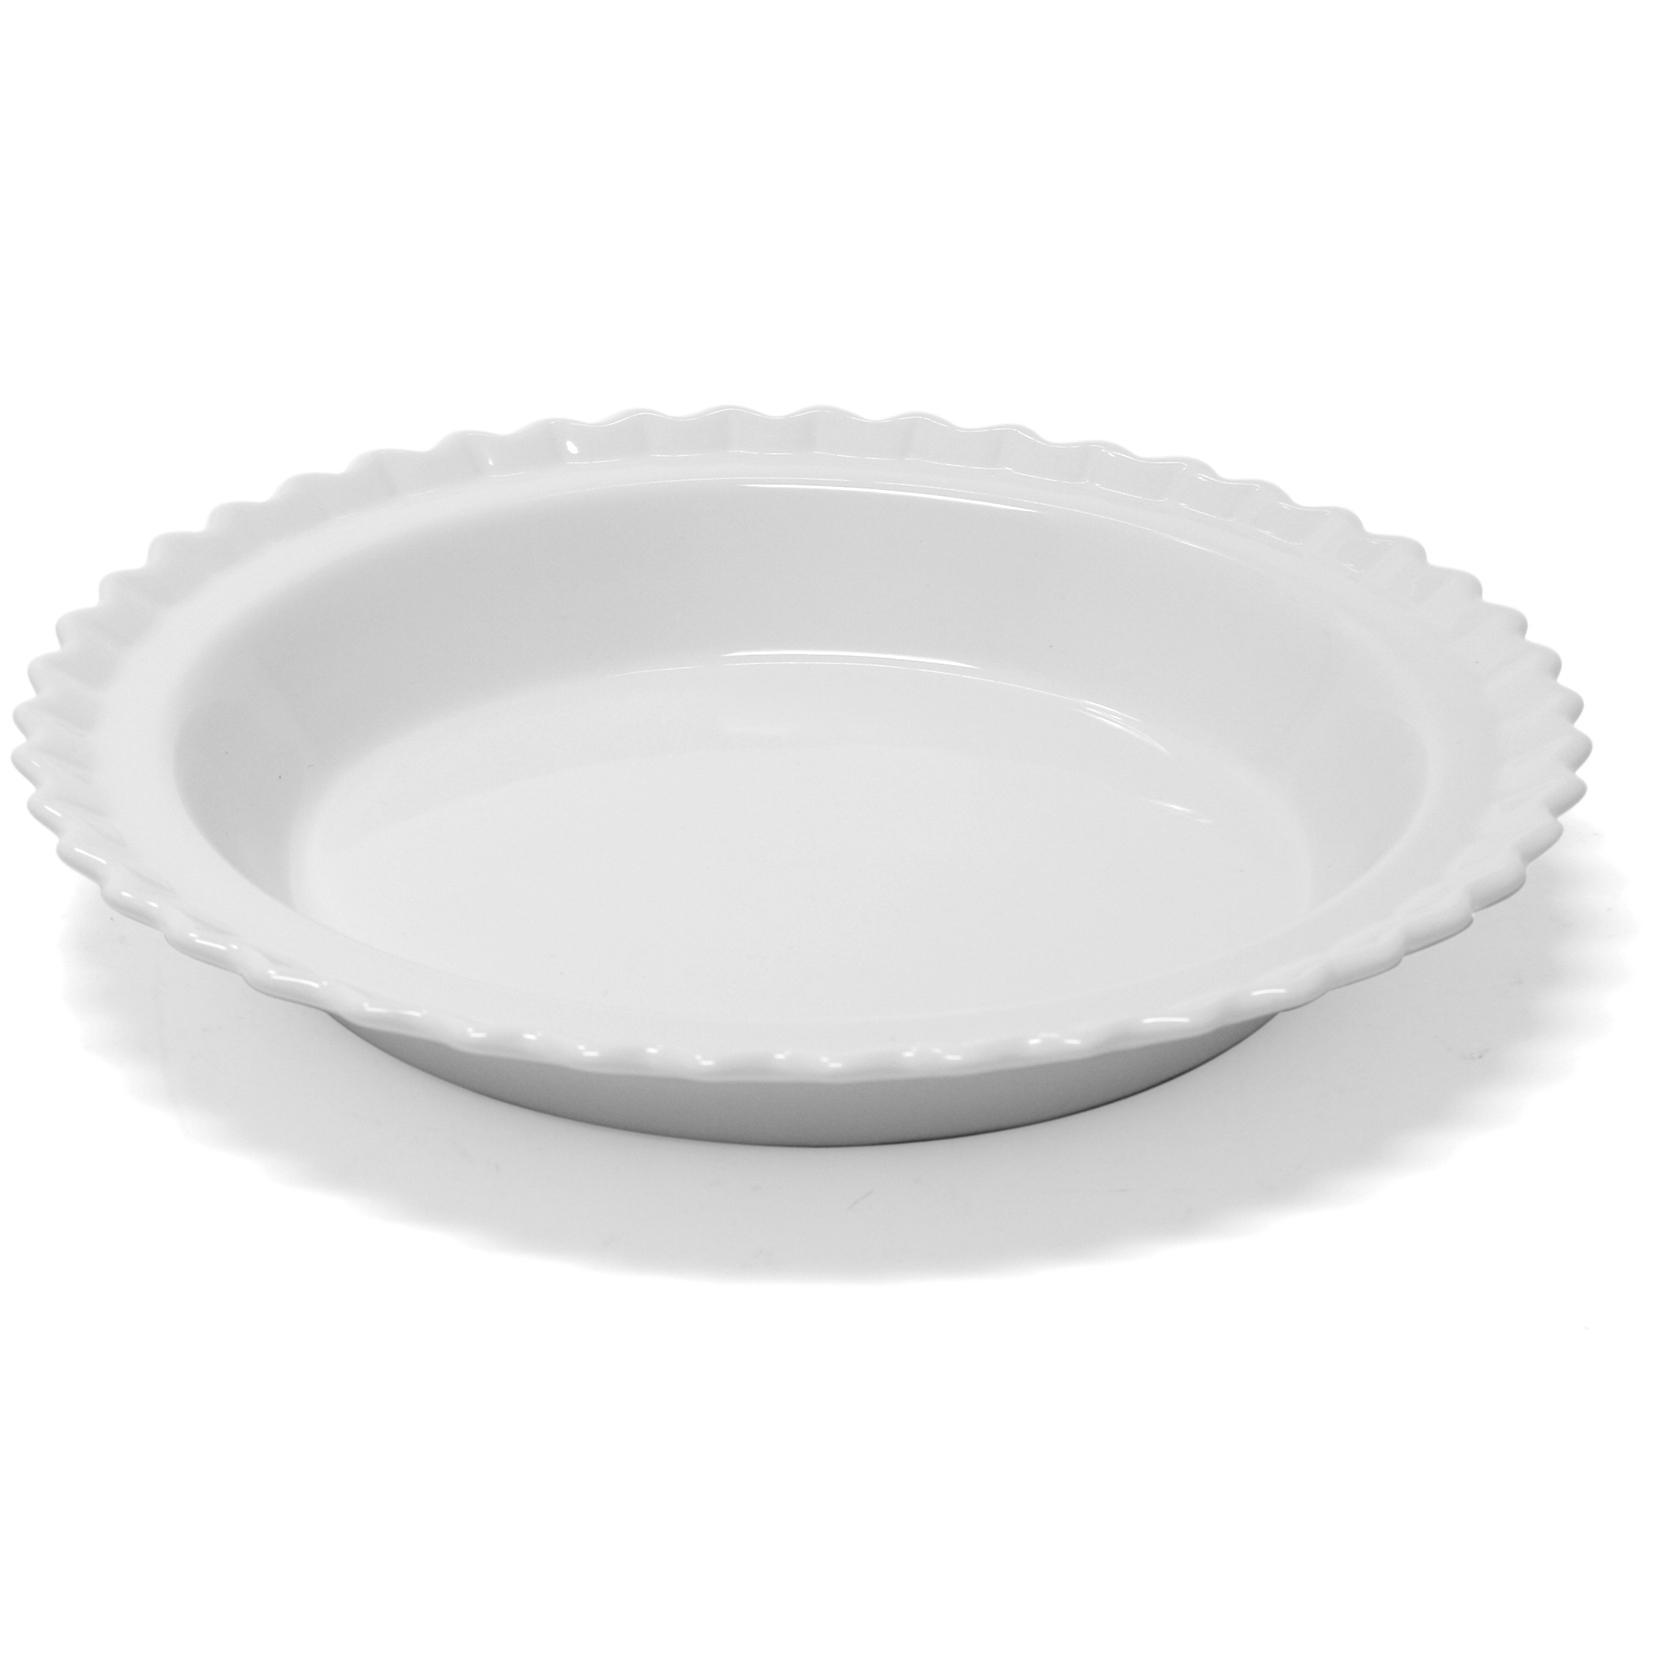 Chantal Glossy White Ceramic Classic Pie Dish, 9 Inch